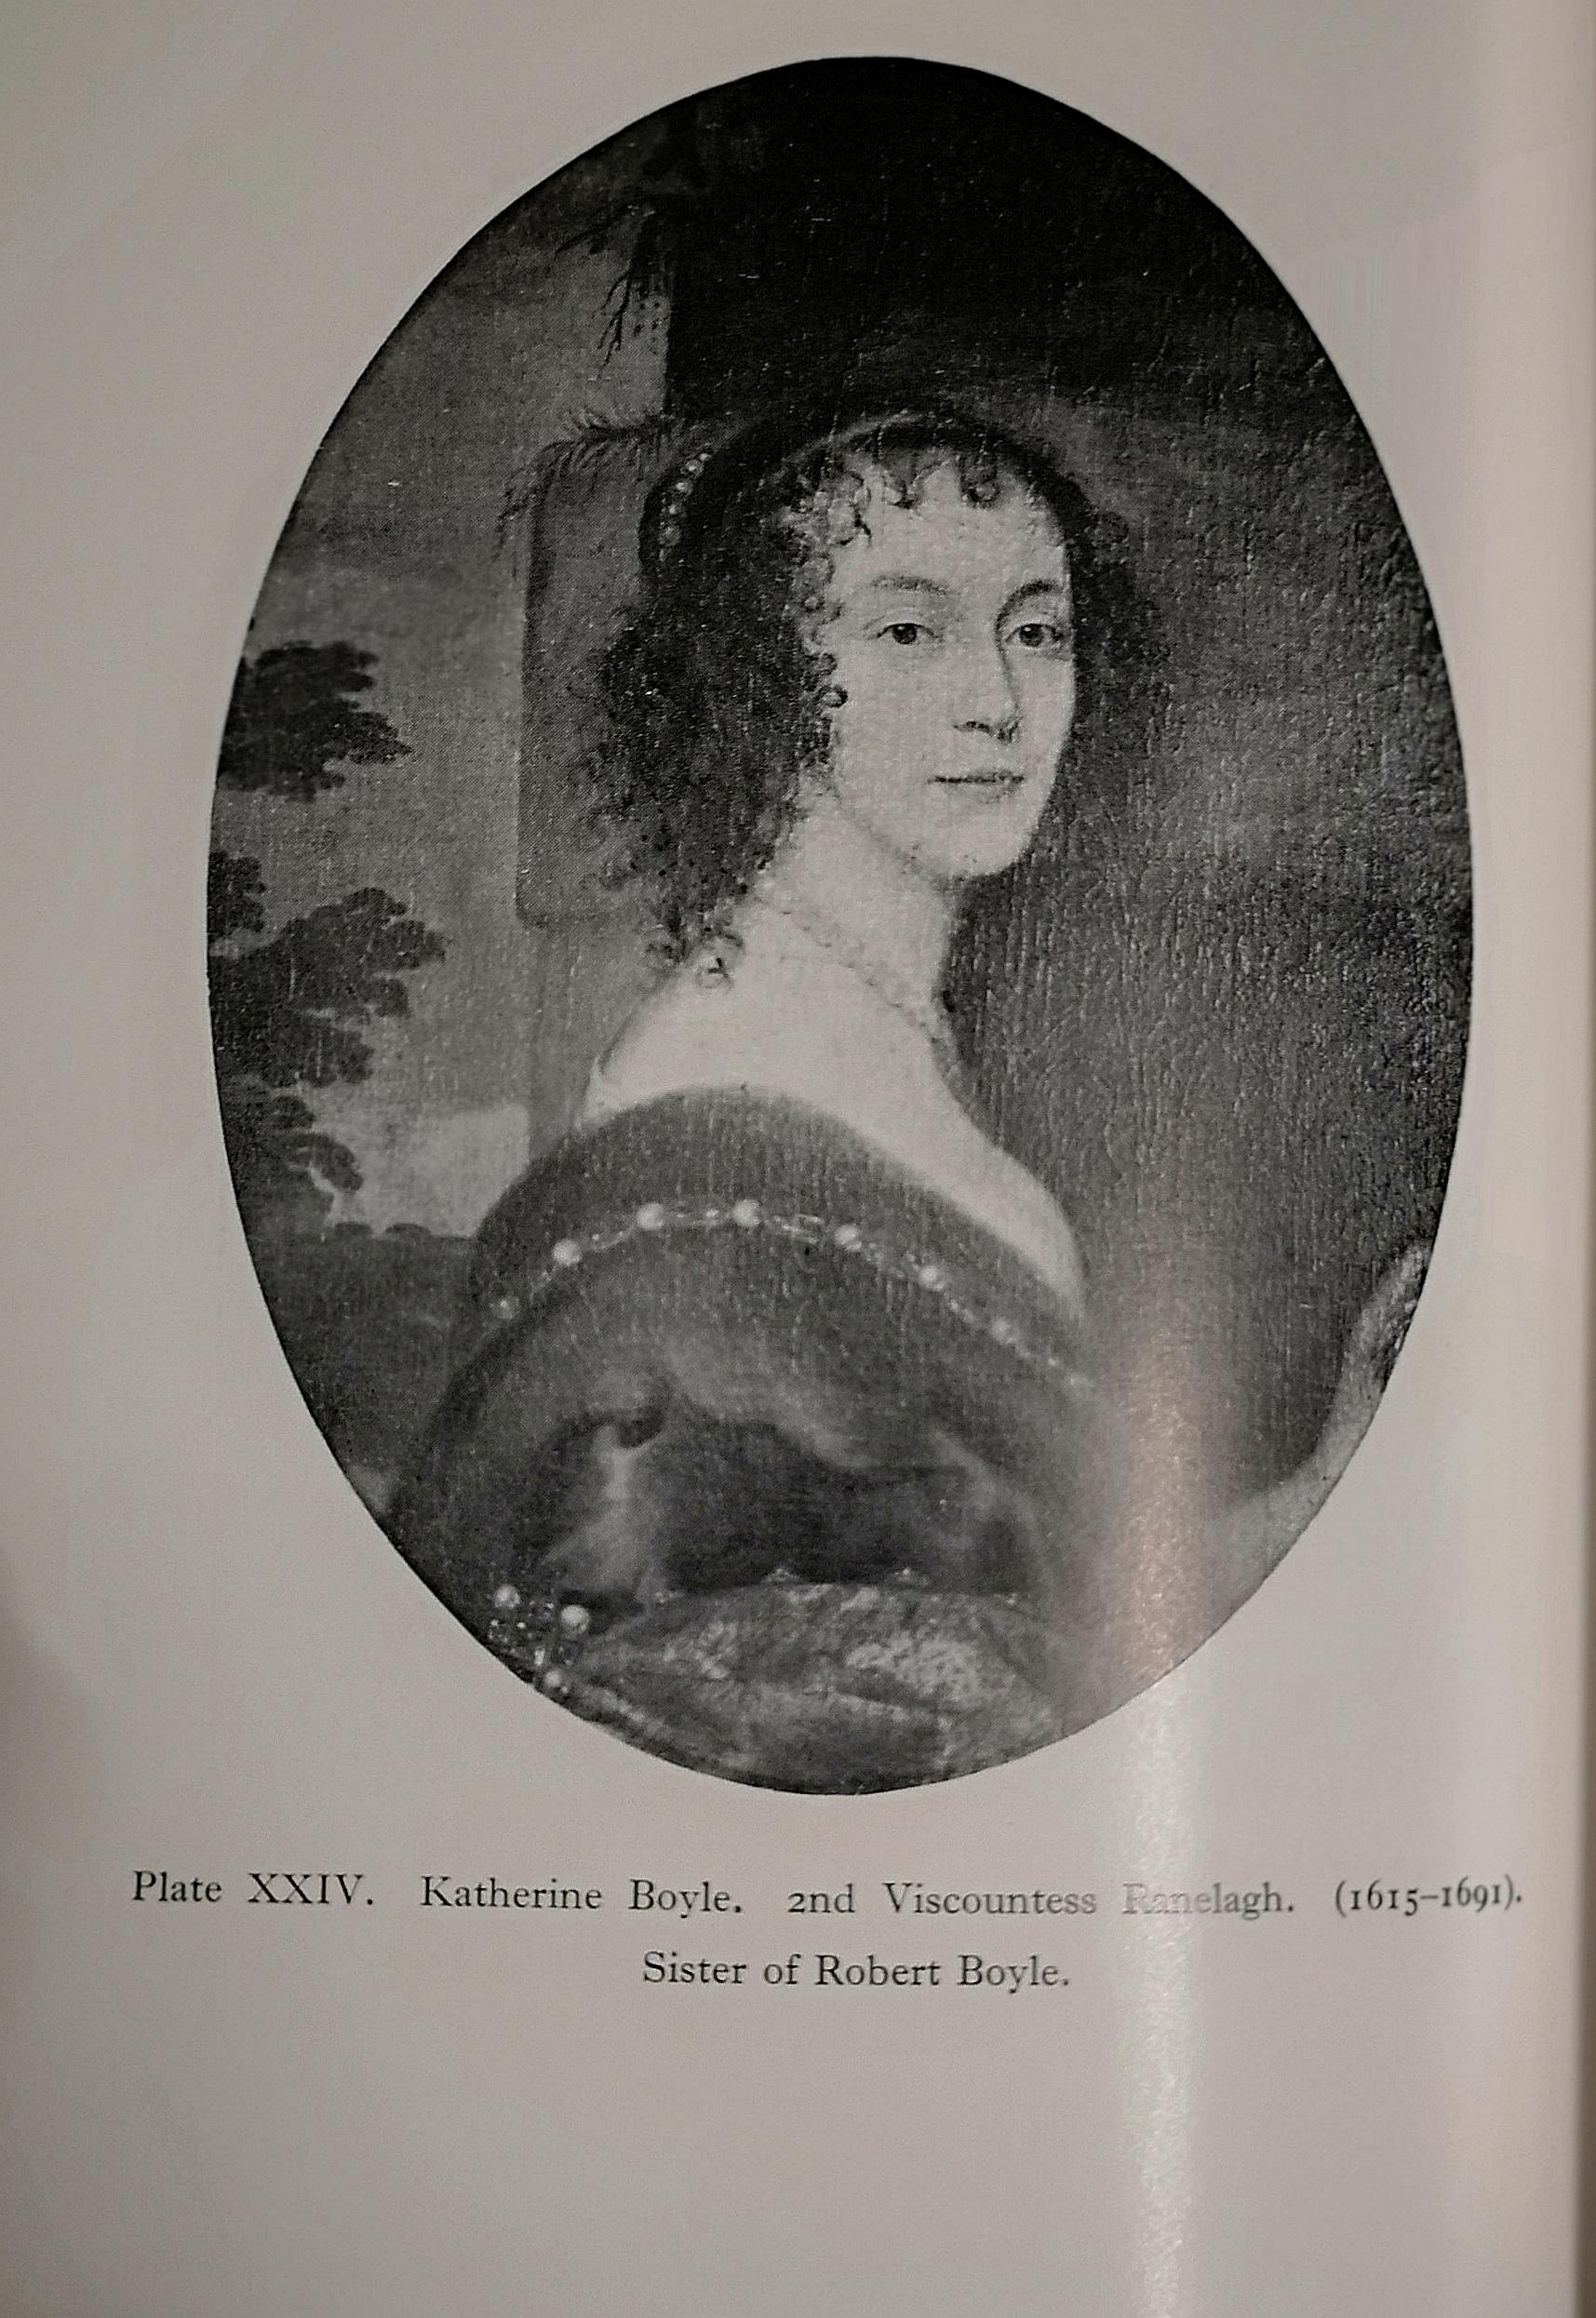 Lady Katherine Jones née Boyle, Viscountess of Ranelagh